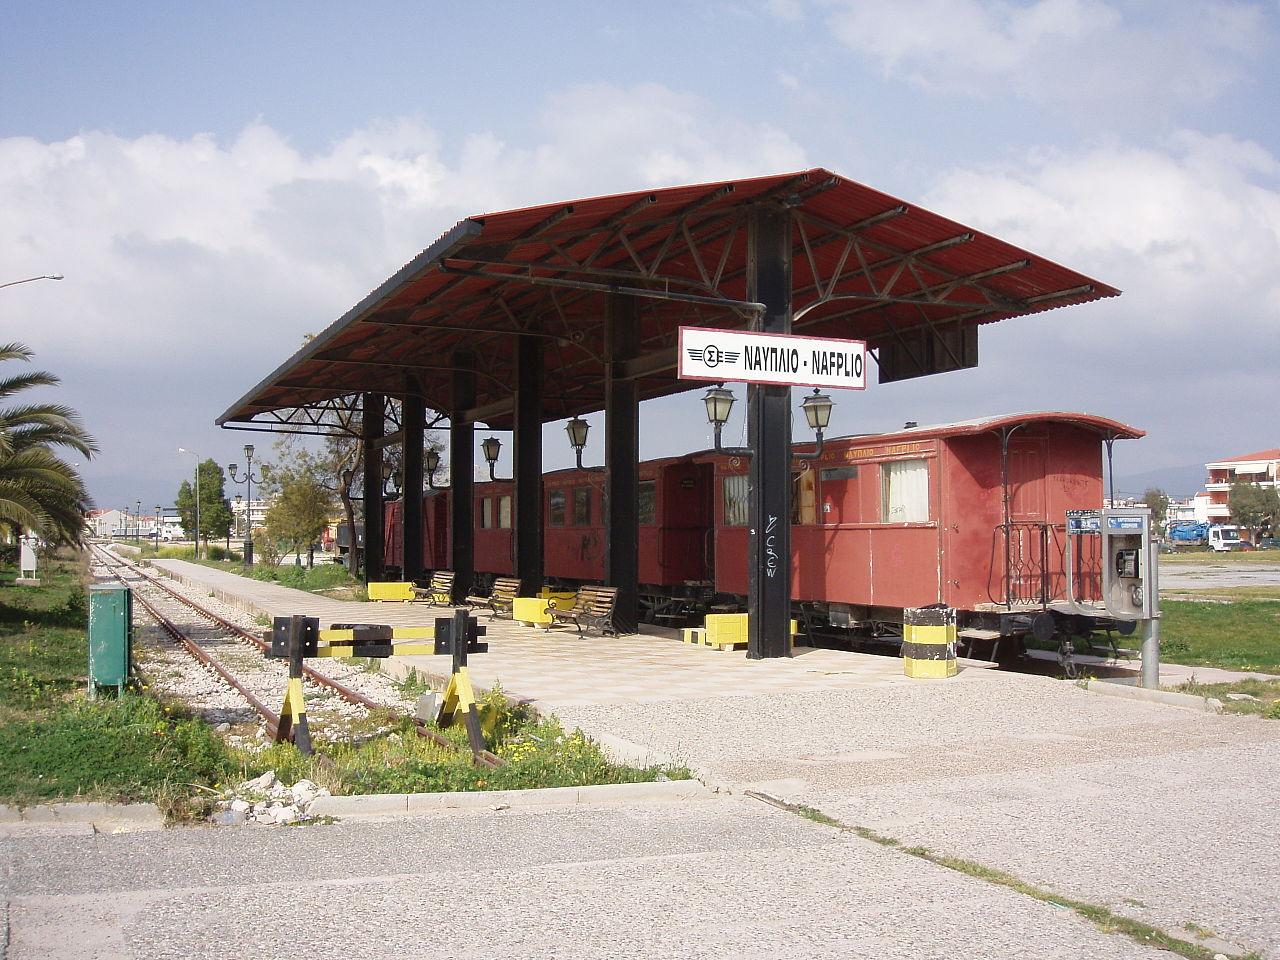 1280px-Nauplia_Bahnhof_2